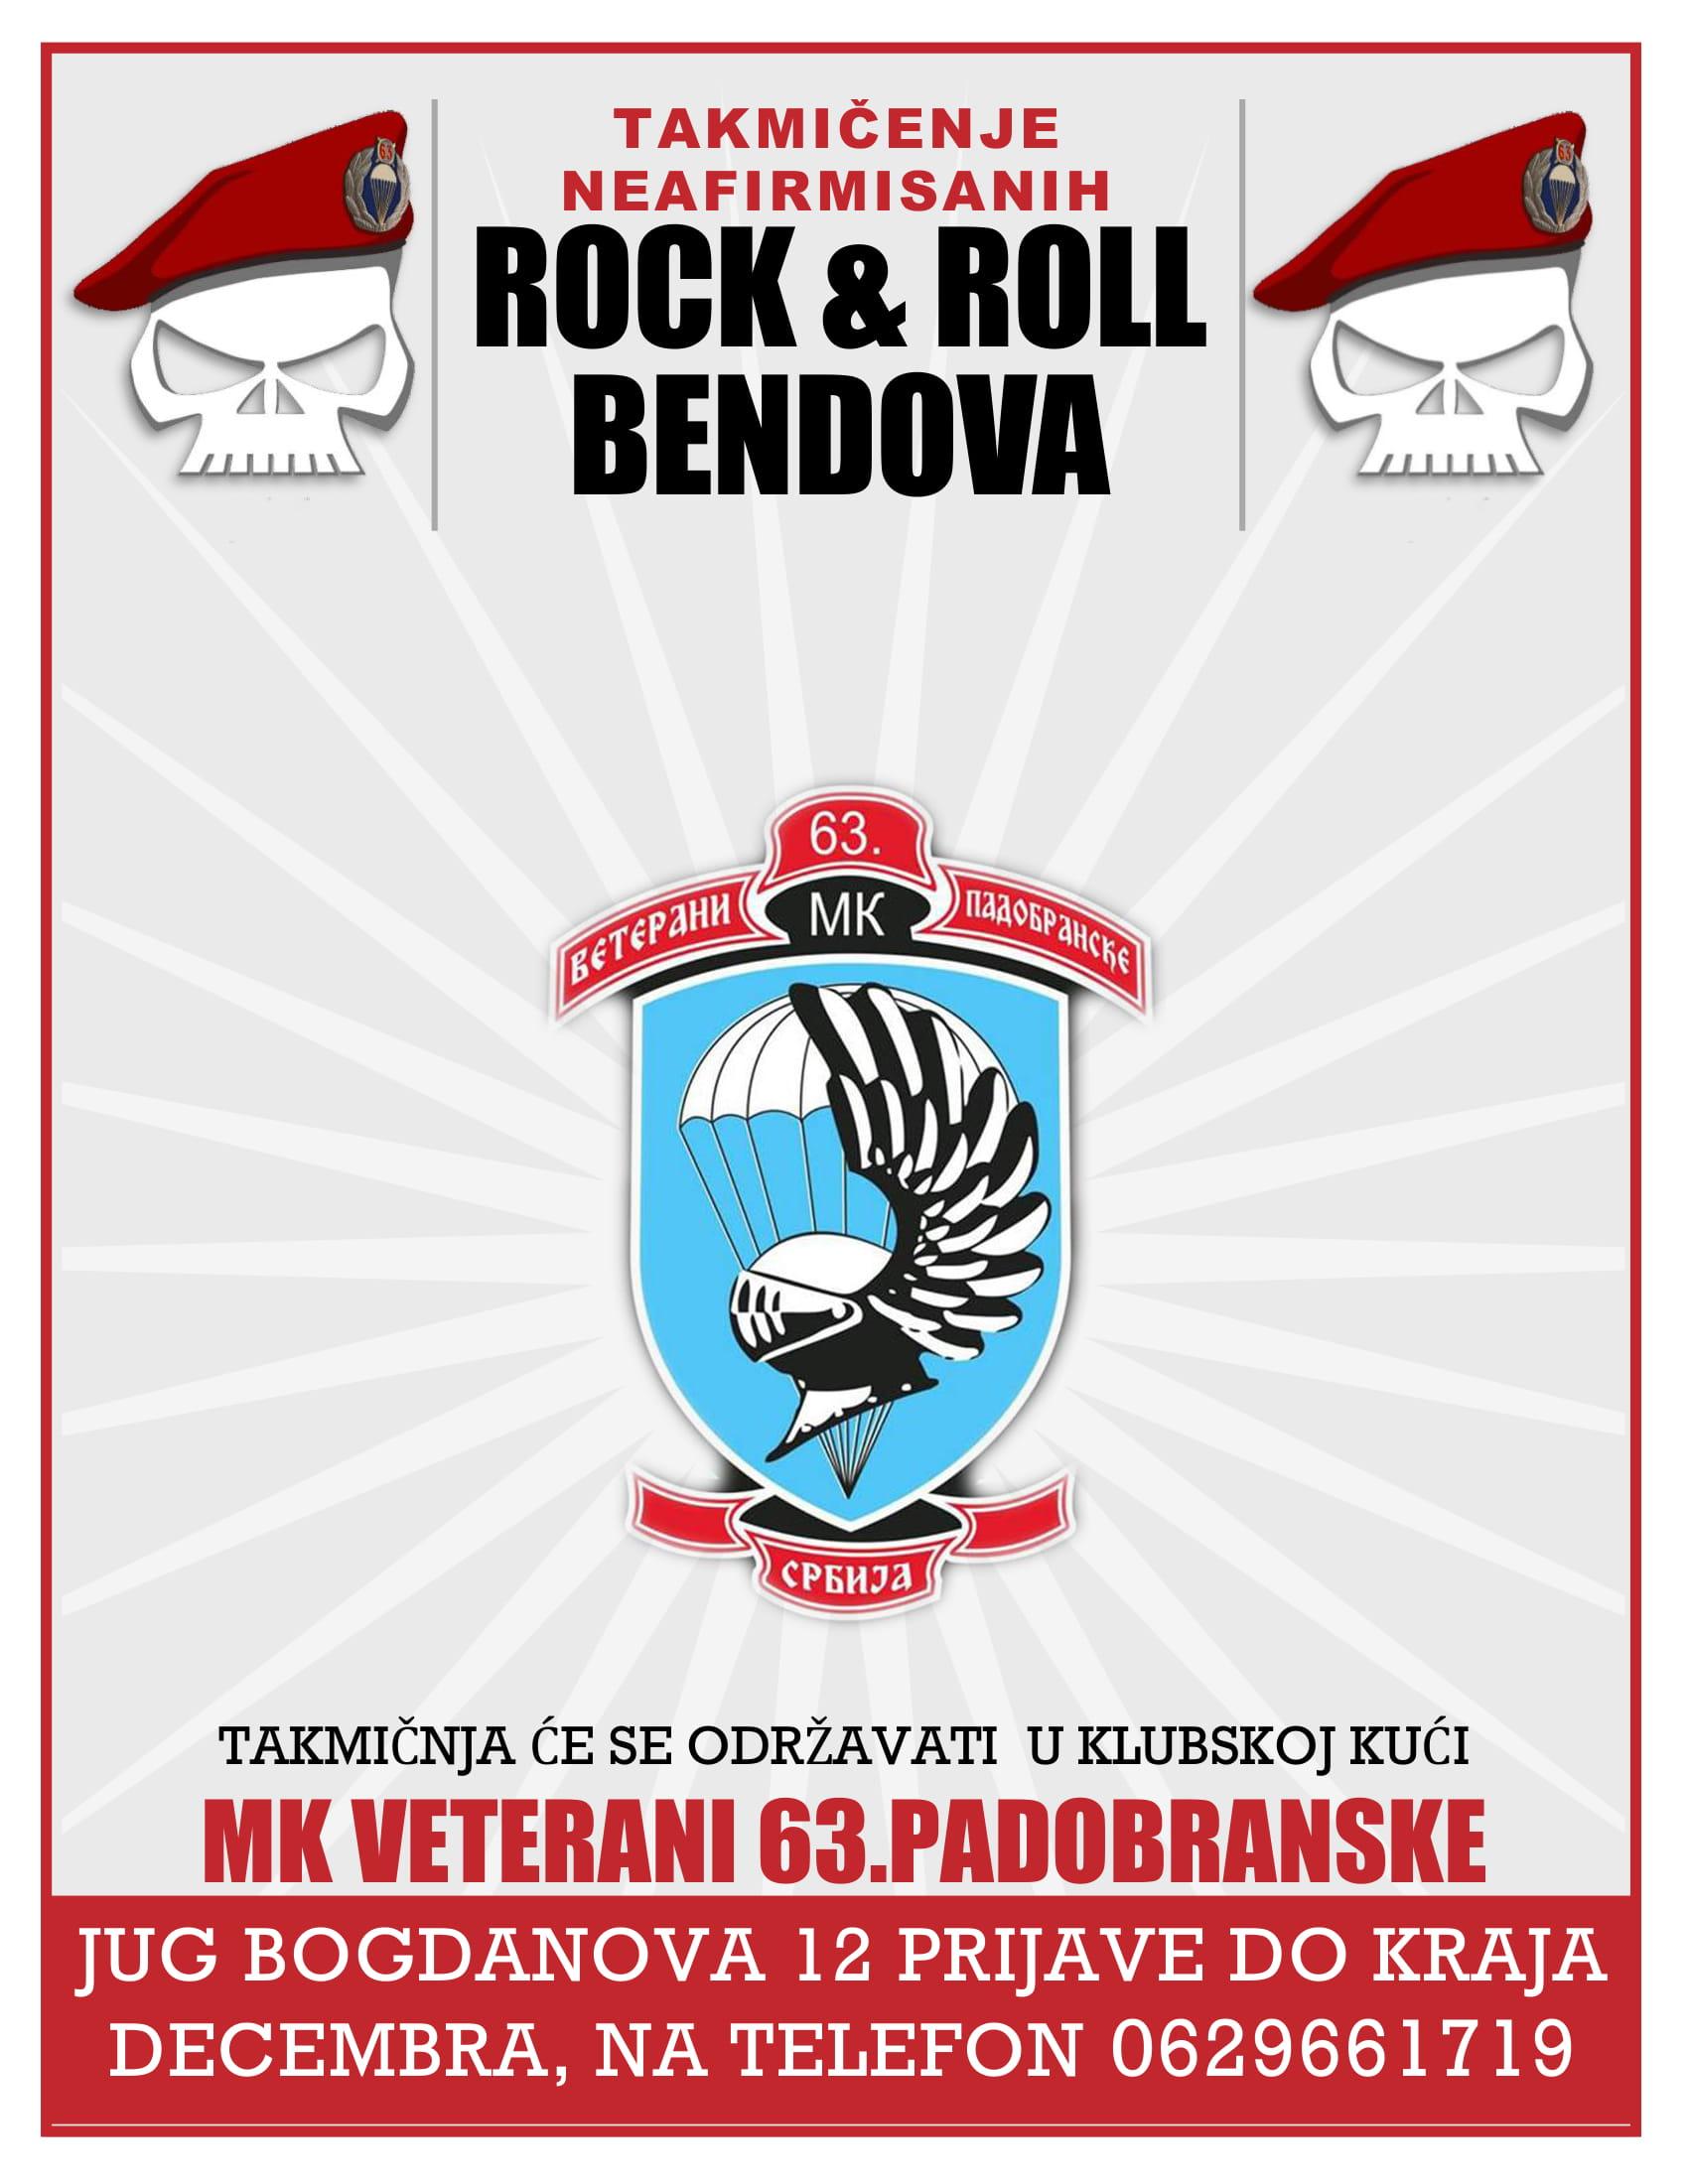 Moto klub veterana 63. padobranske brigade